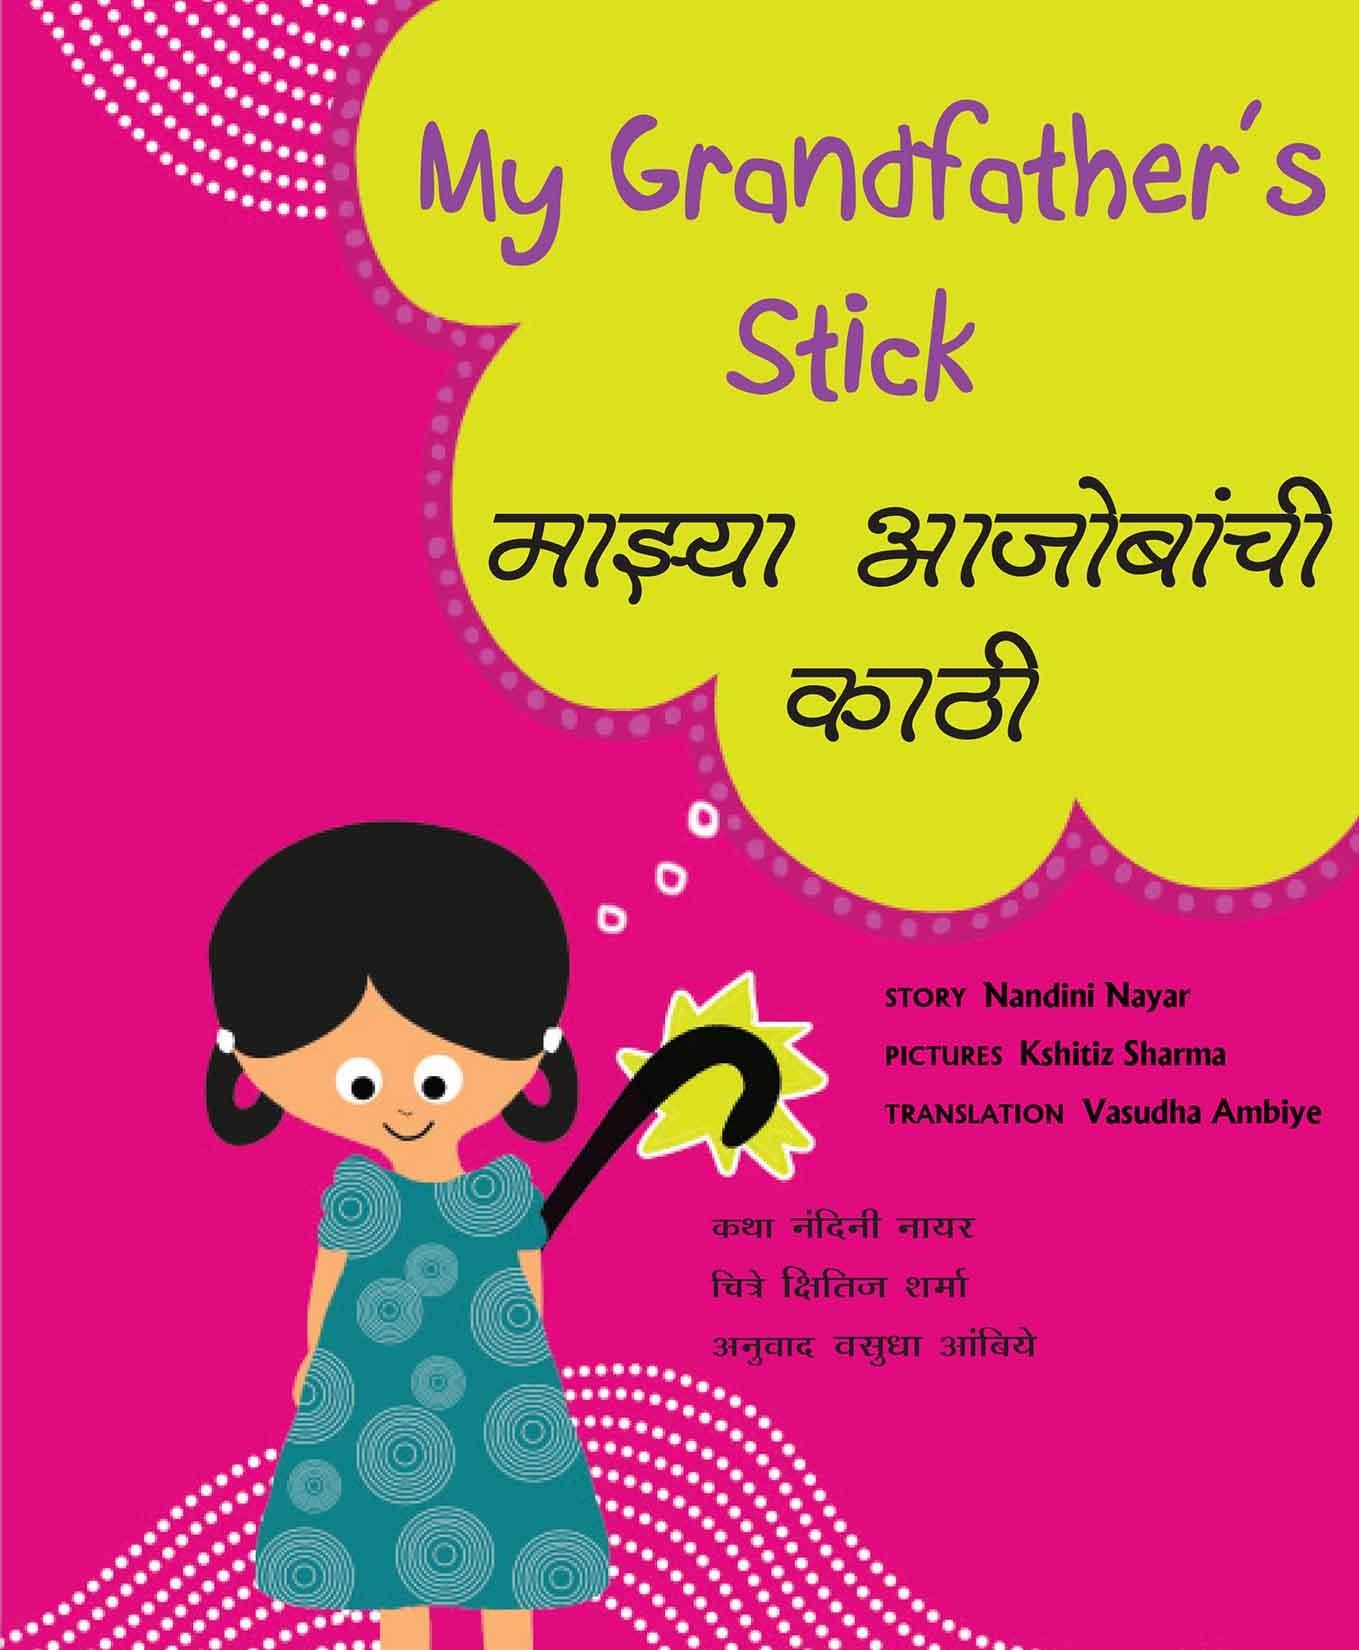 My Grandfather's Stick/Majzya Aajobachi Kathi (English-Marathi)